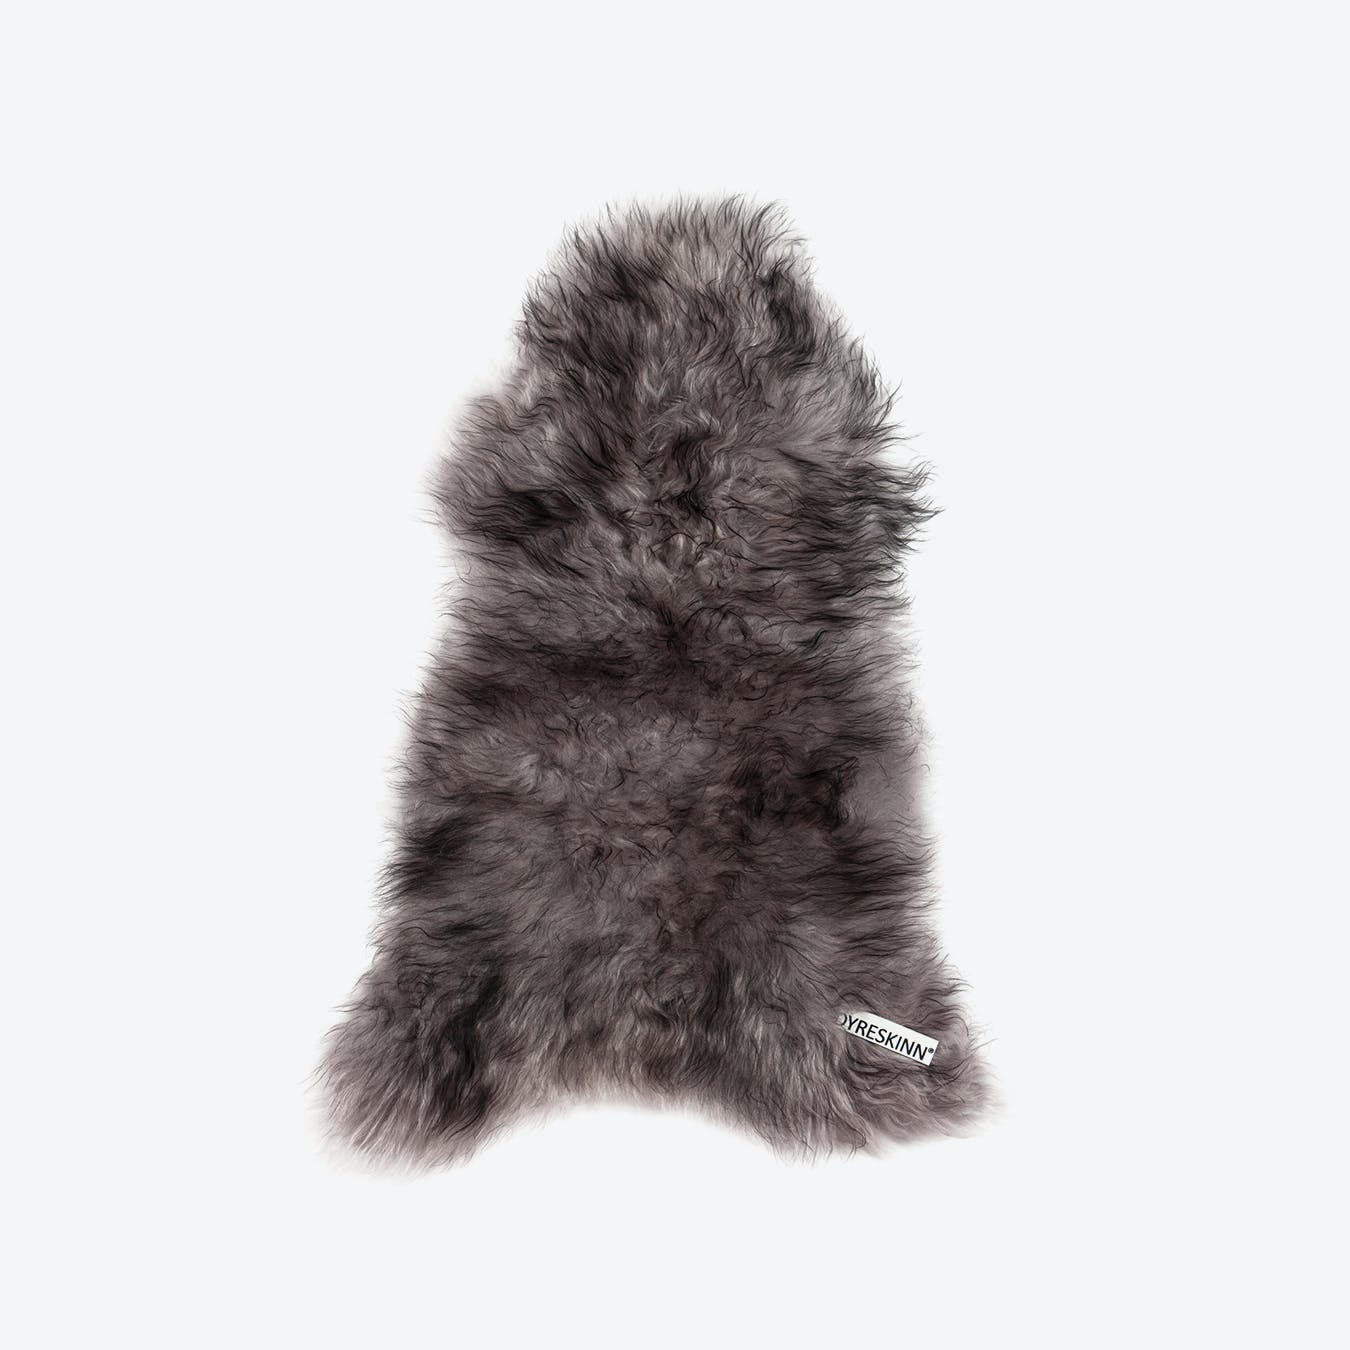 Icelandic Sheepskin Rug - Melange Grey